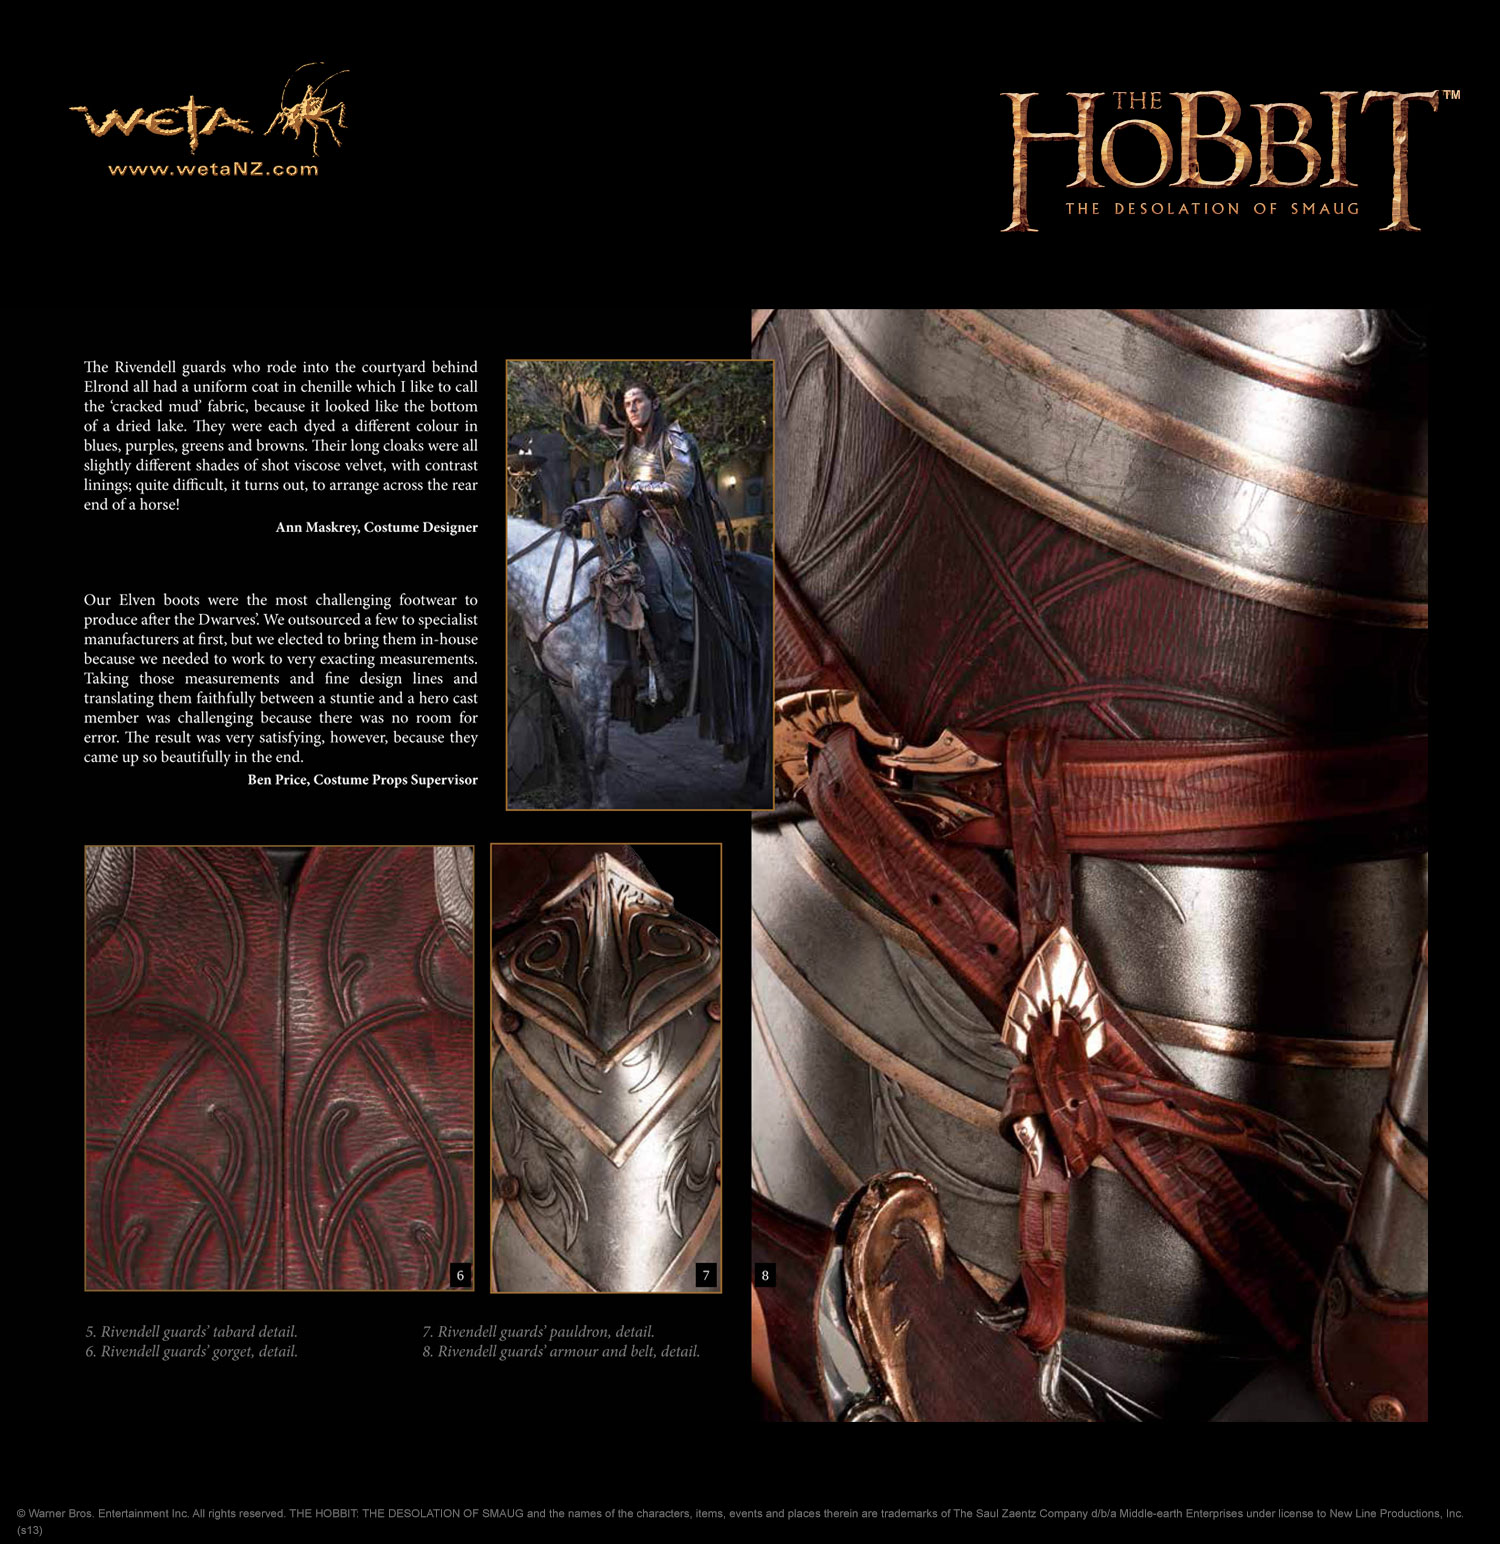 hobbit-chroniclesDoSCloaksDaggerse2